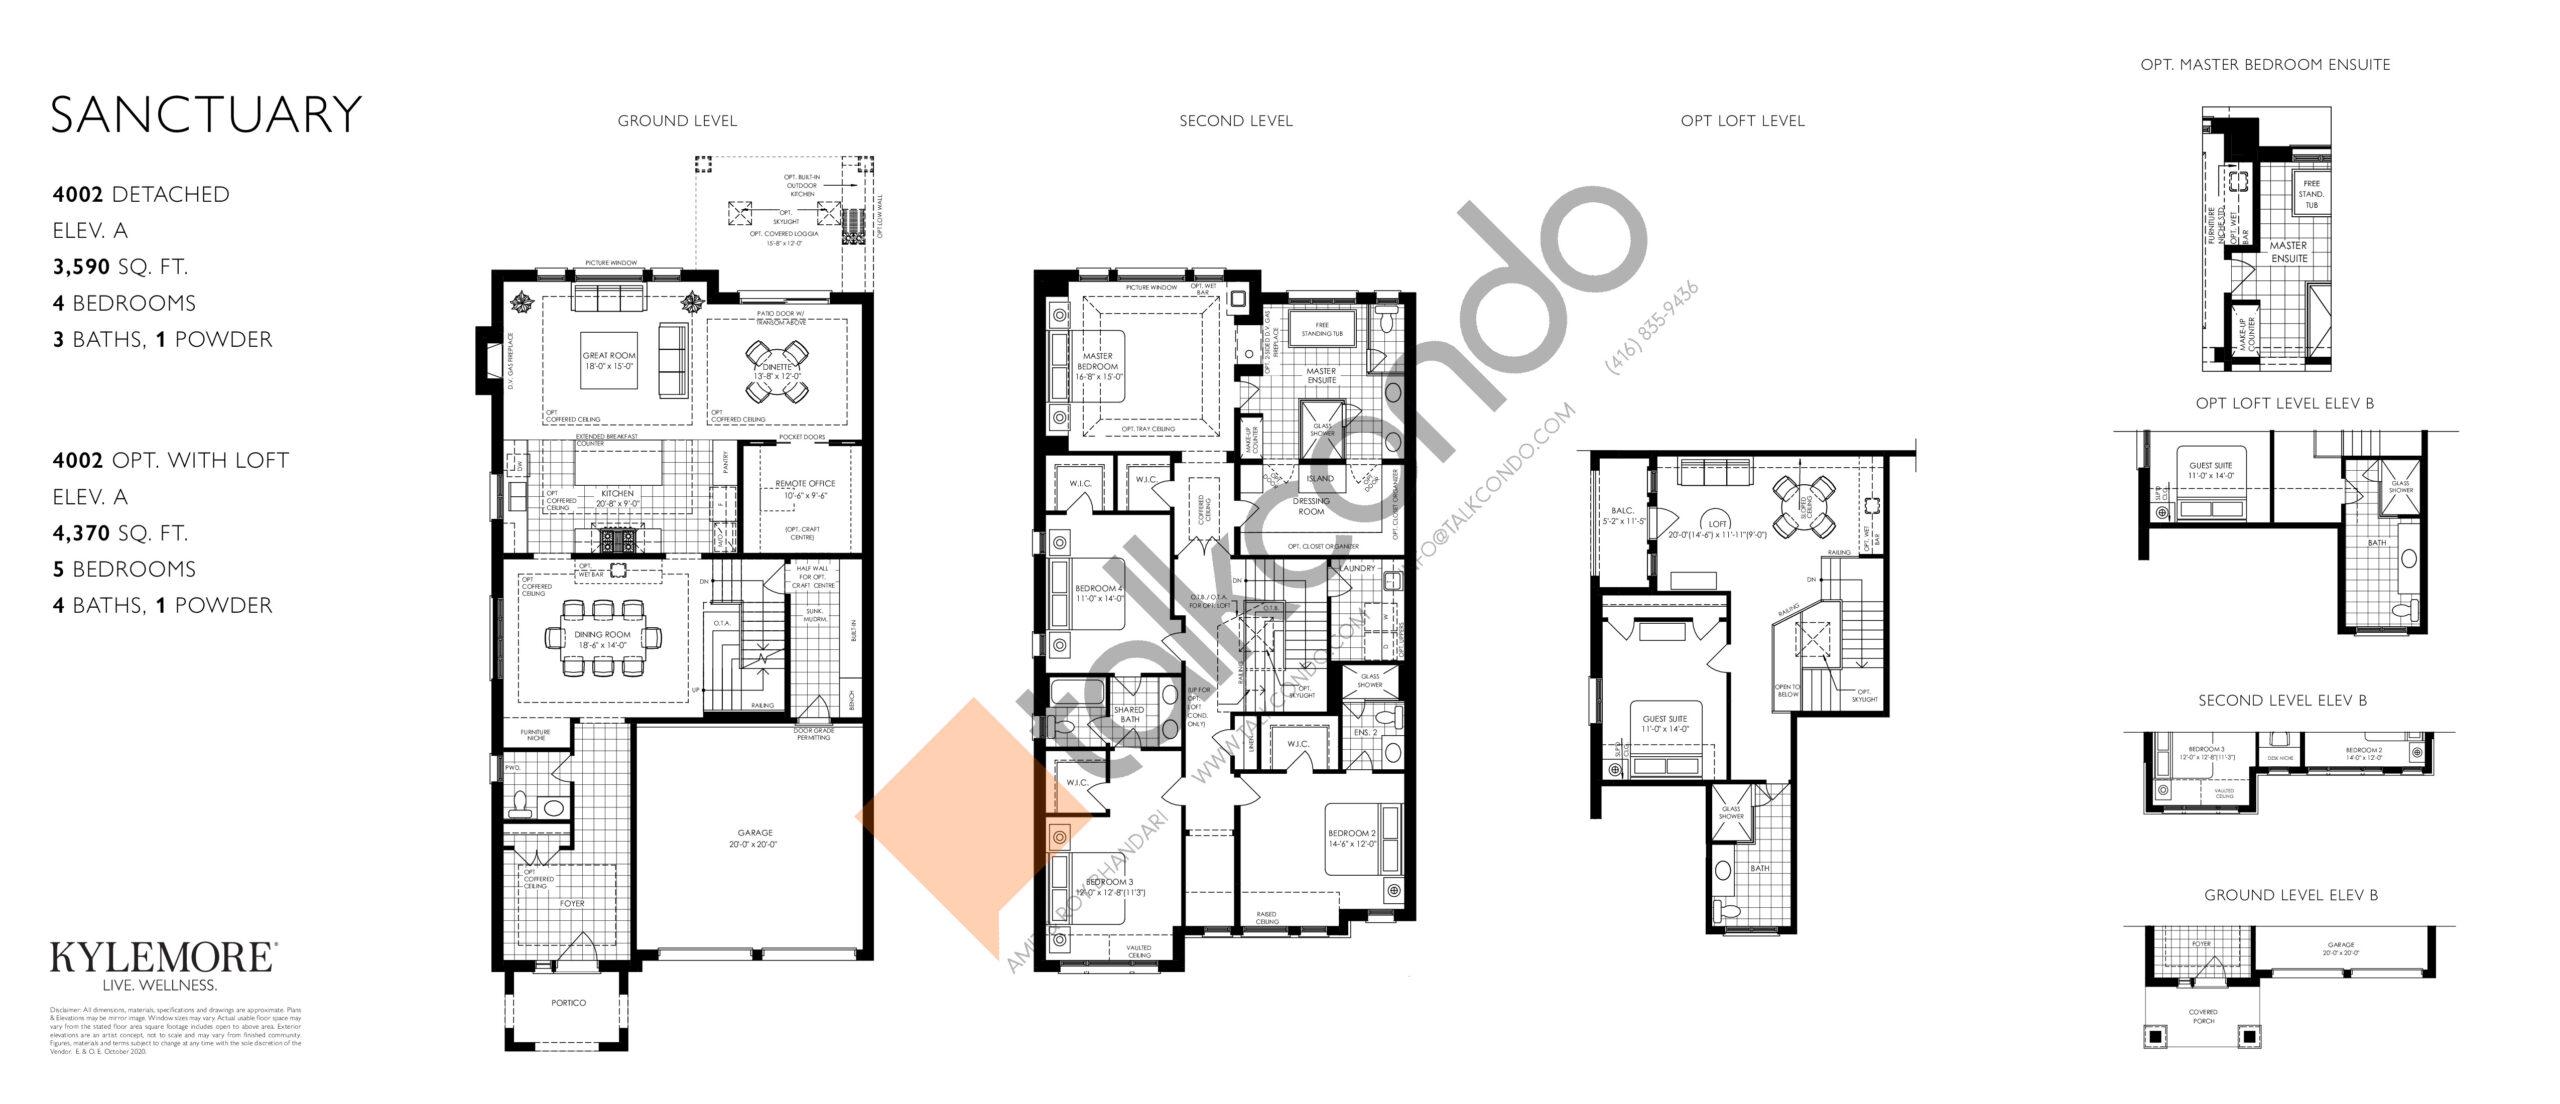 Sanctuary (Opt. Loft) Floor Plan at Angus Glen South Village - 4370 sq.ft